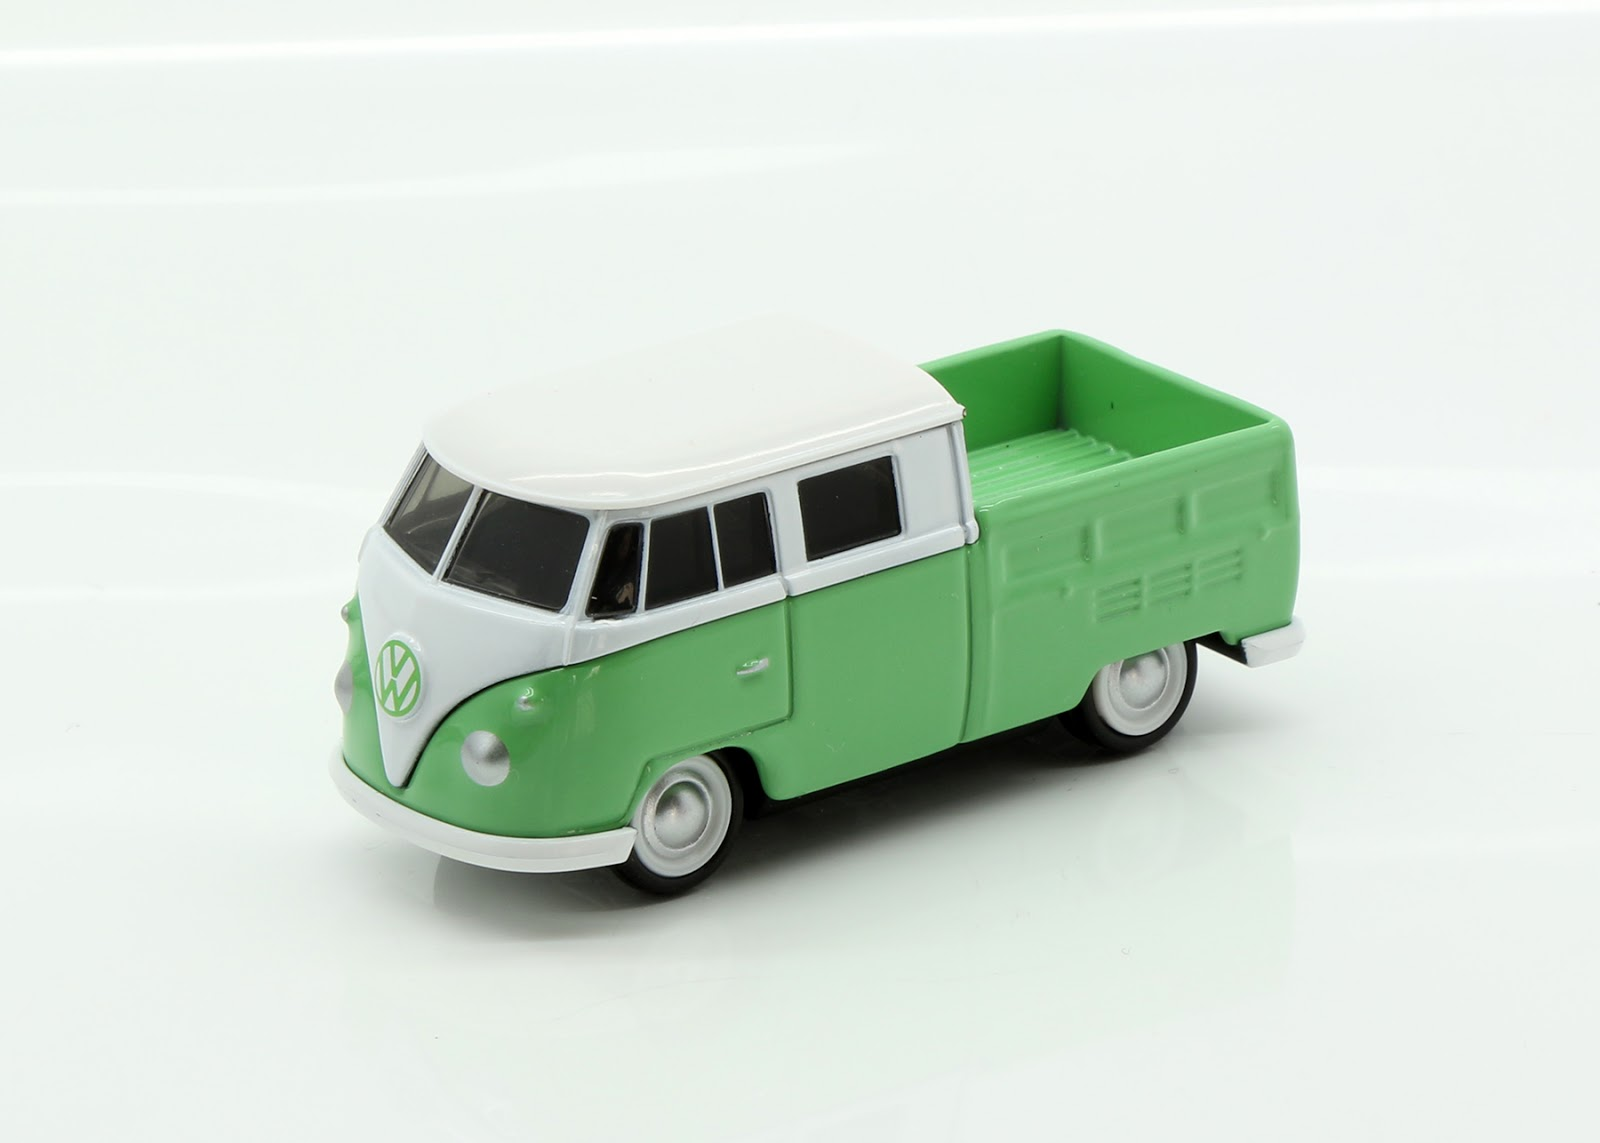 incredible mini garage volkswagen t1 1959 double cab 1 64 tomica. Black Bedroom Furniture Sets. Home Design Ideas